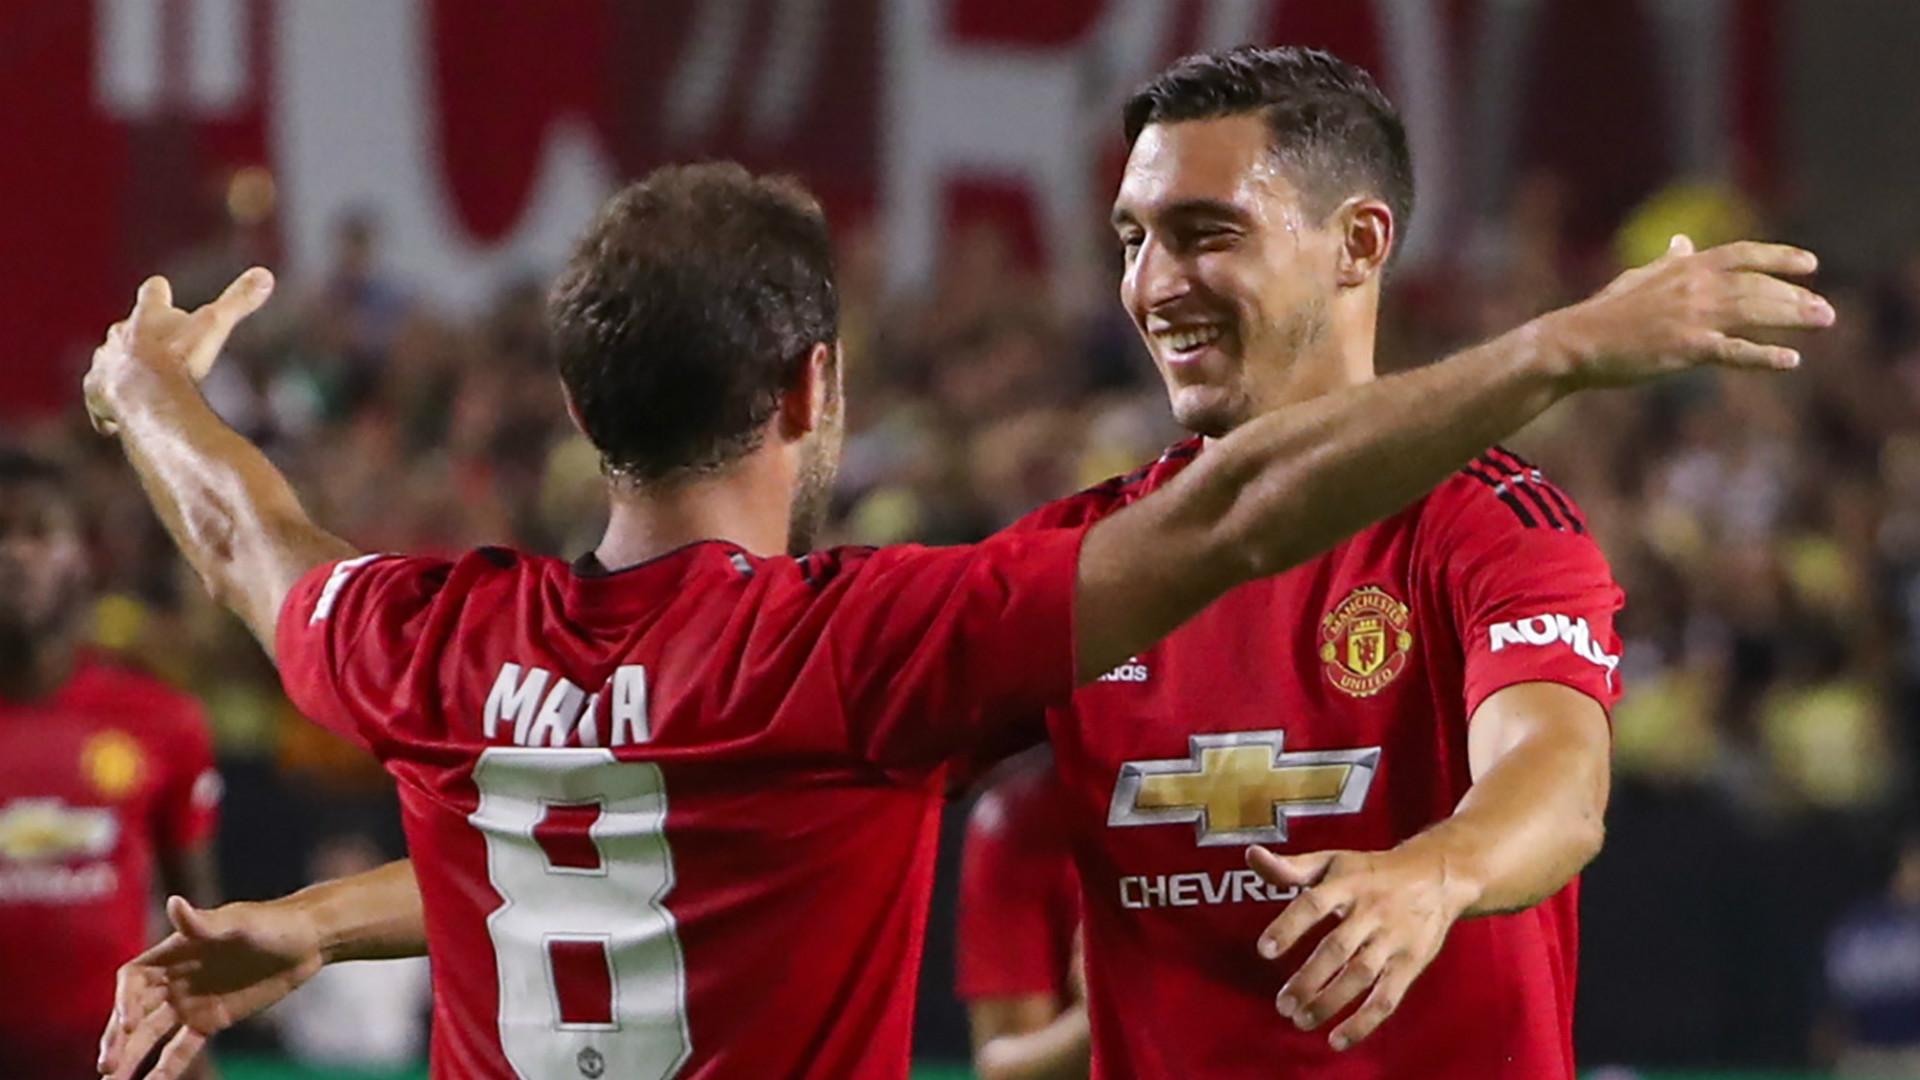 Matteo Darmian Bersikeras Ingin Tinggalkan Manchester United